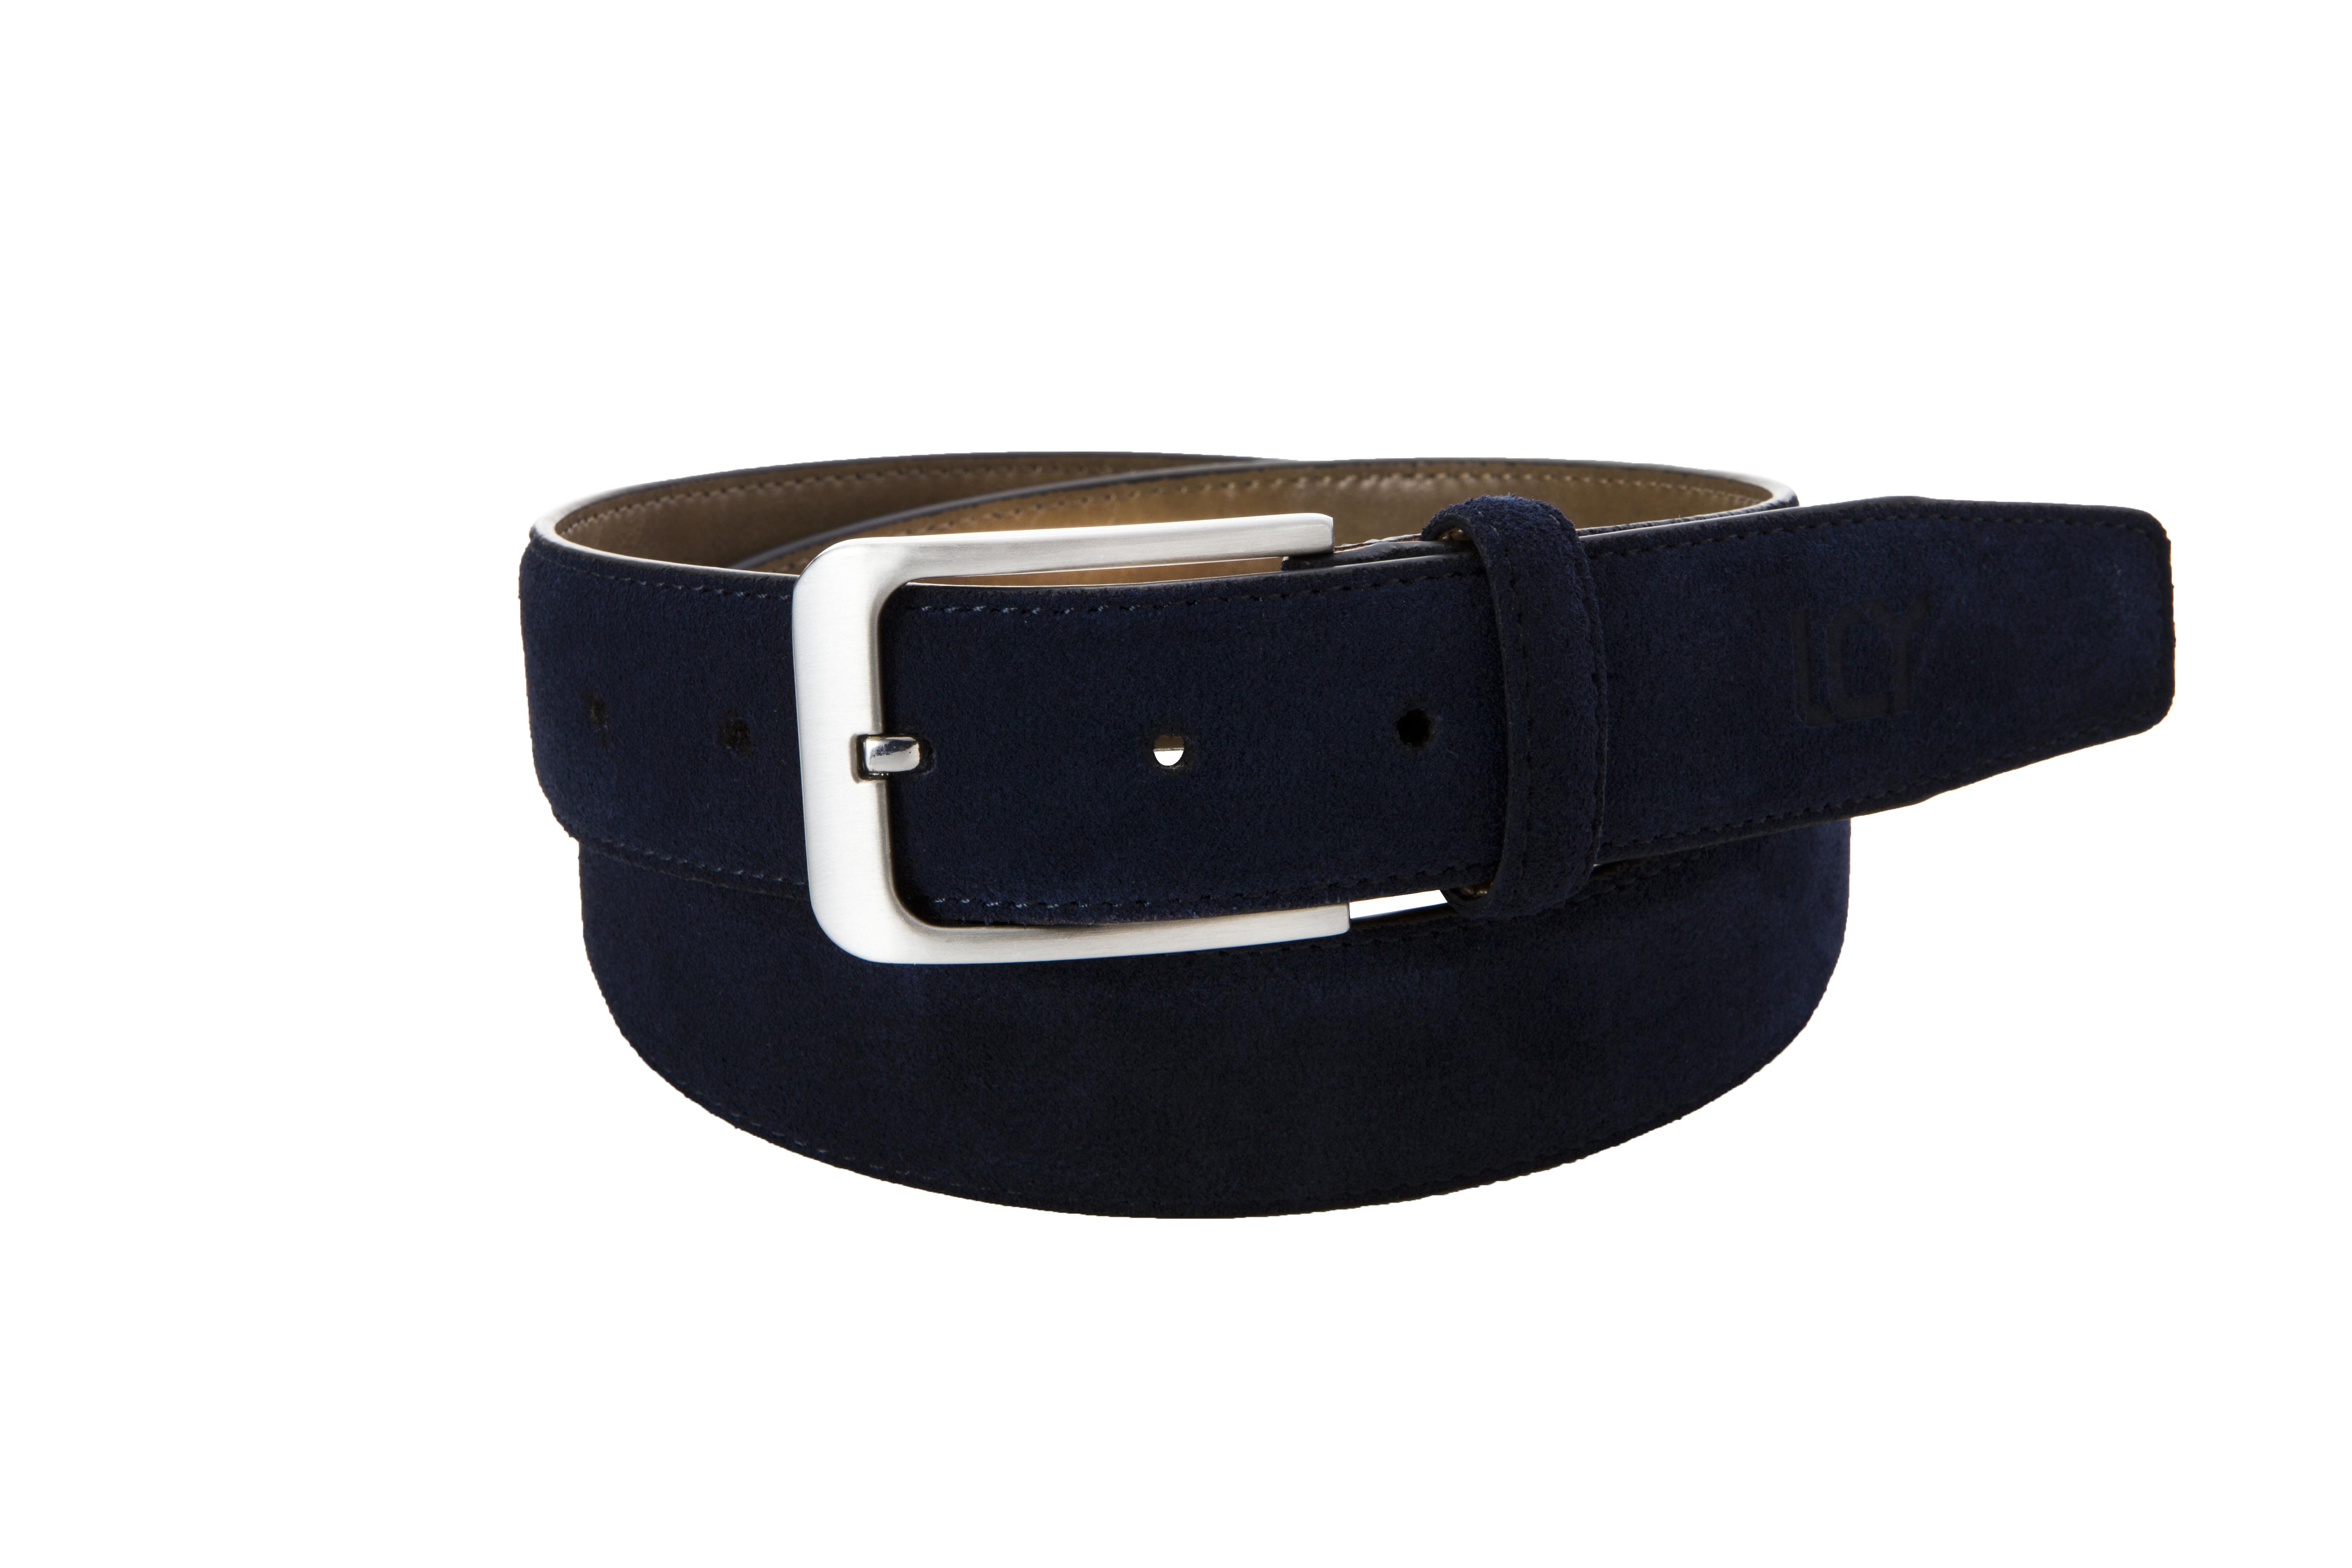 m s place s suede leather belt 35mm belt